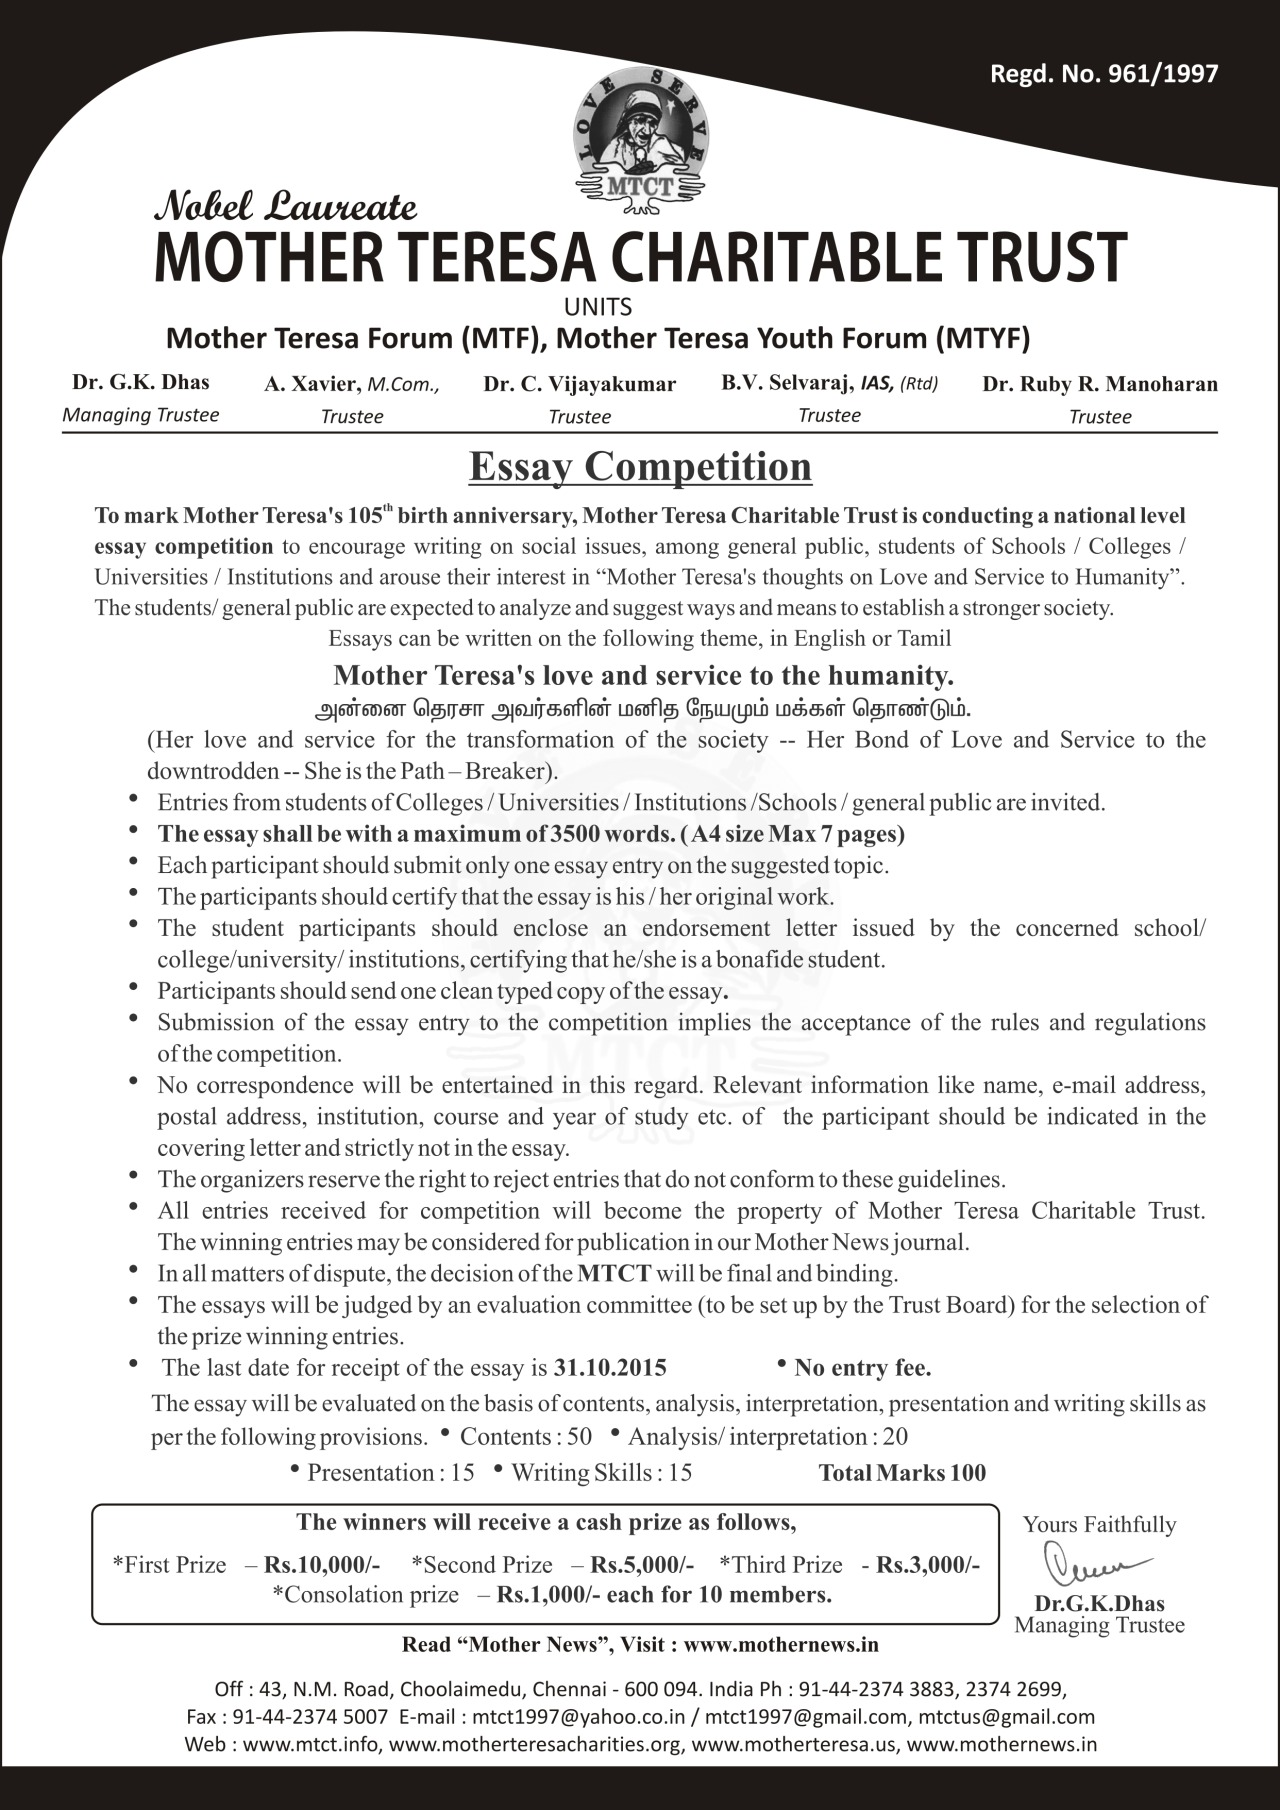 012 Trust Essay Tumblr Nv14i7scpj1ua8wu5o1 1280 Fantastic Titles Essays Free Full